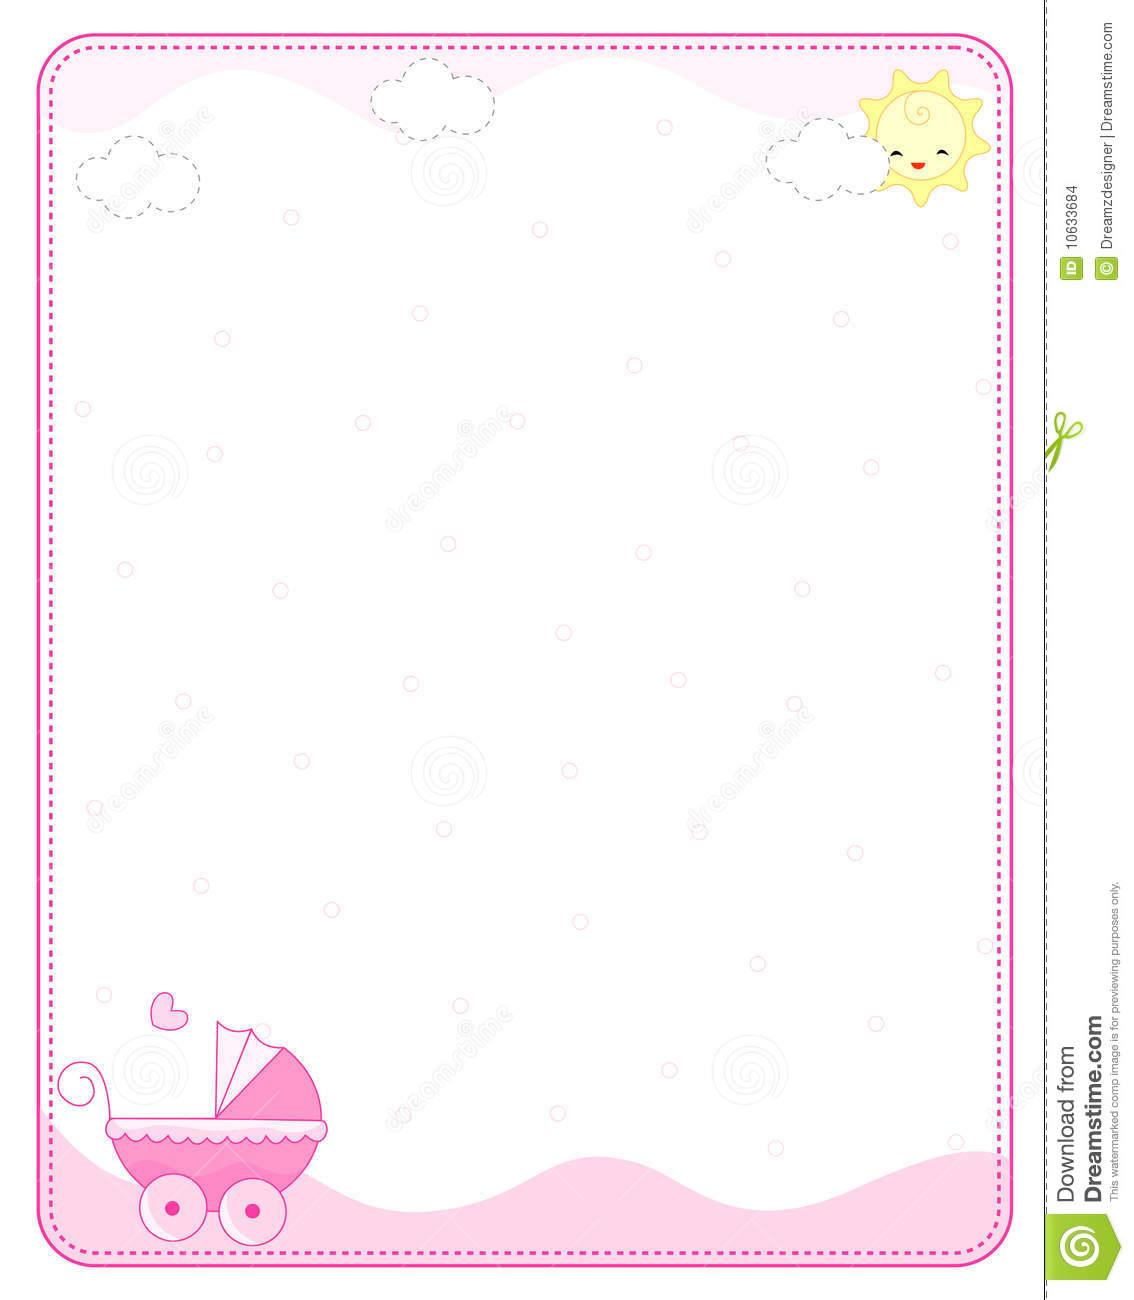 Baby girl border clipart vector free stock Baby girl border clipart 1 » Clipart Station vector free stock